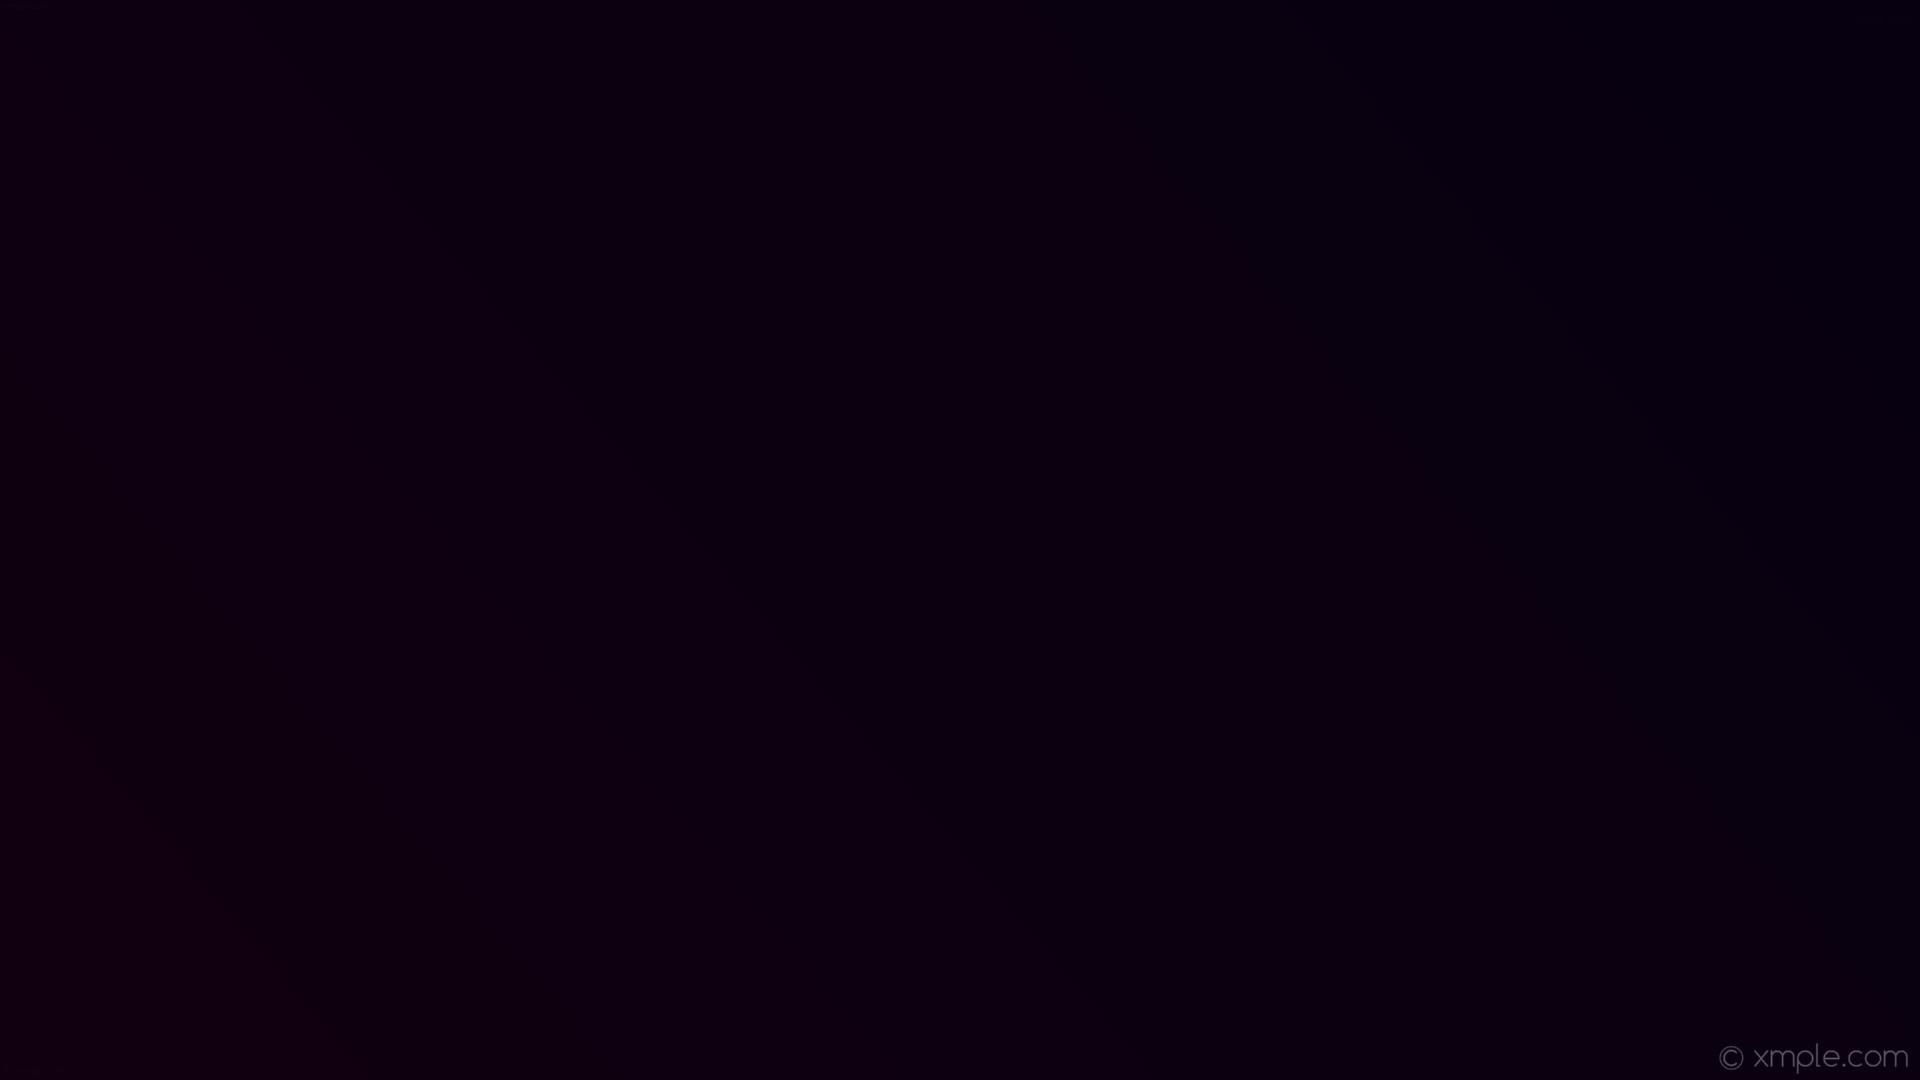 wallpaper black gradient linear #100010 #070010 195°